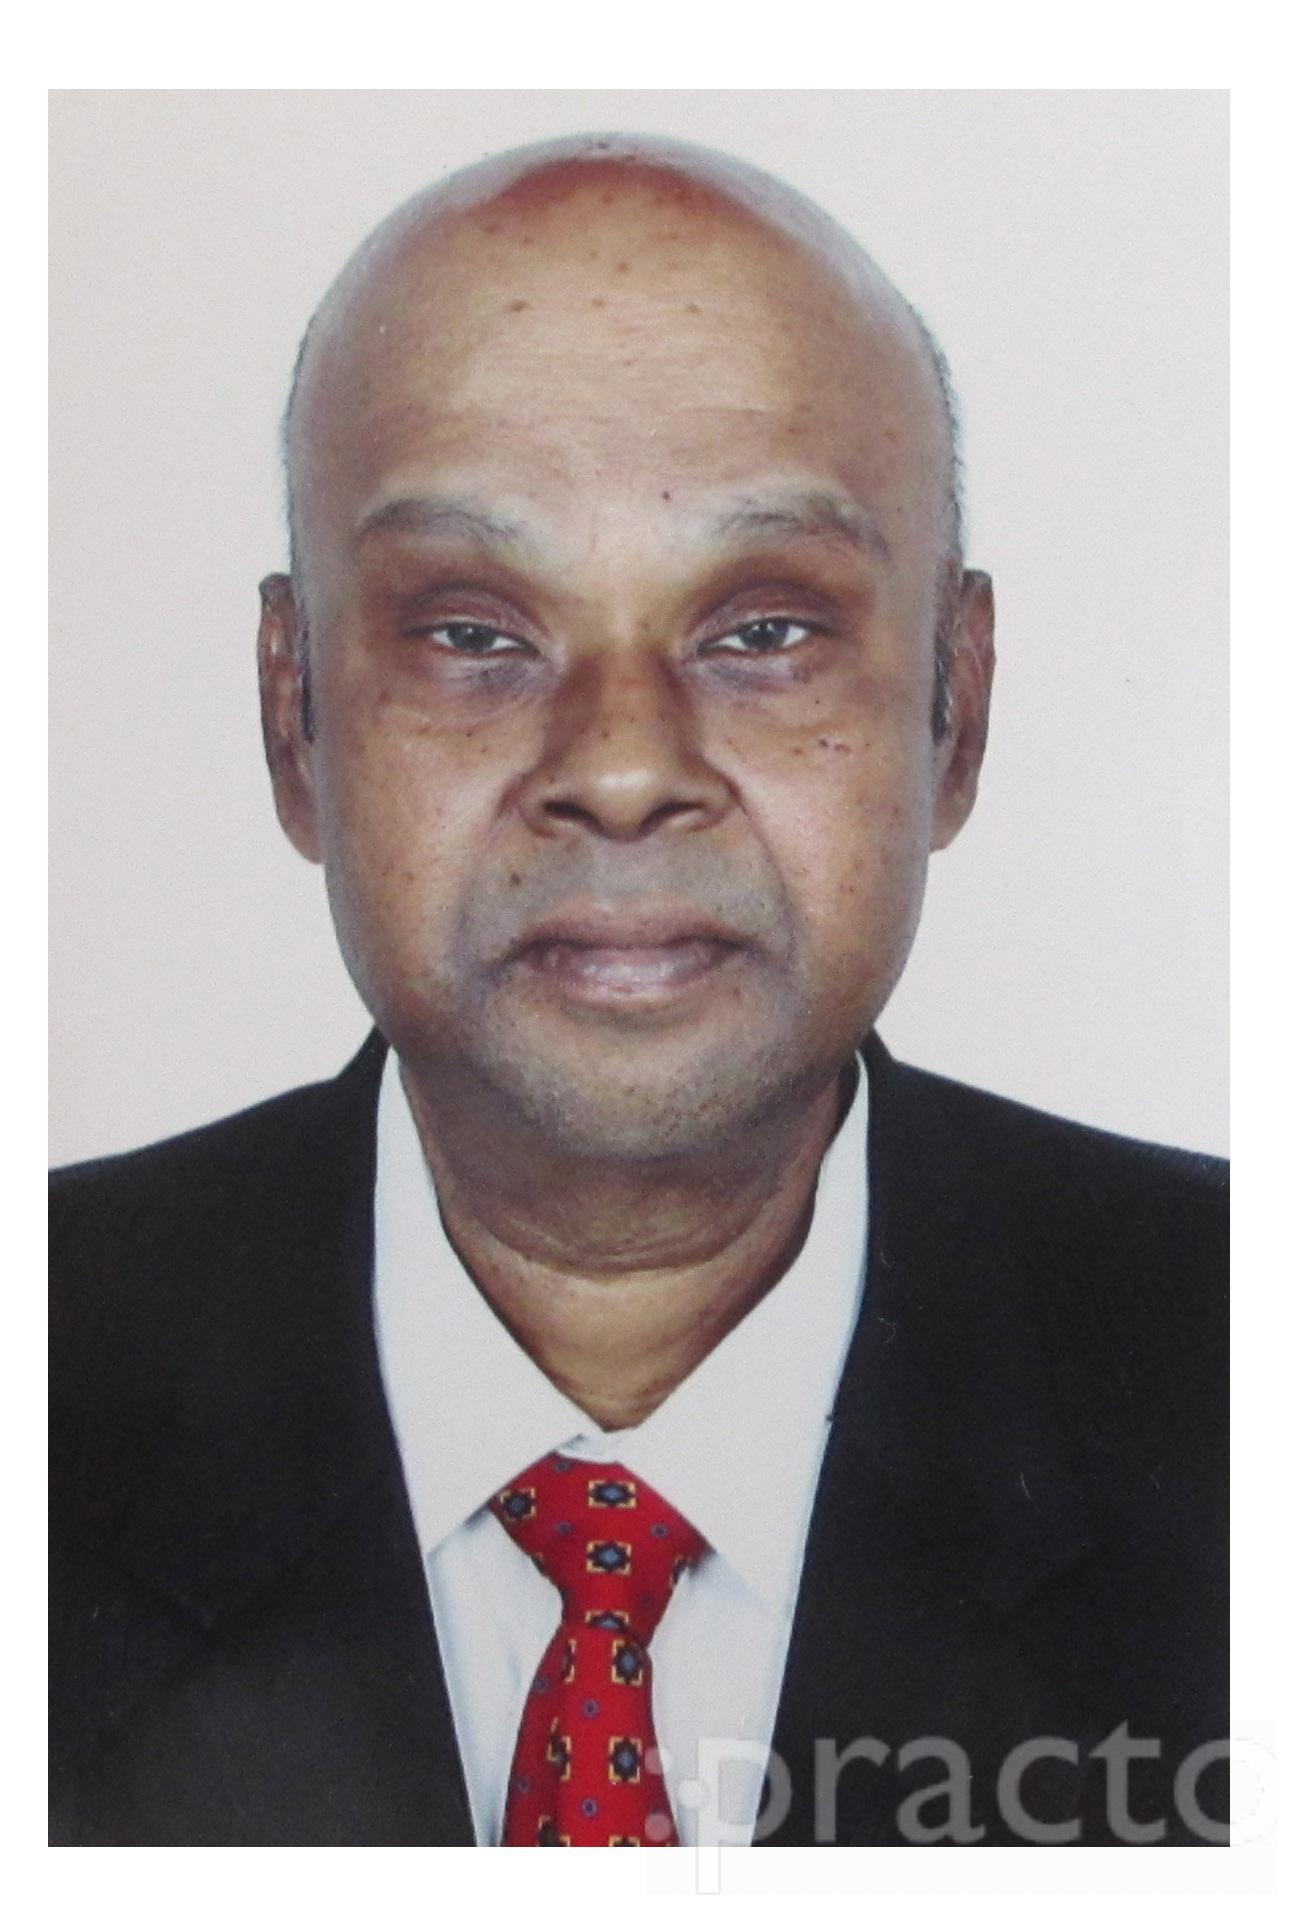 Dr. Sunil Kumar S - Ear-Nose-Throat (ENT) Specialist